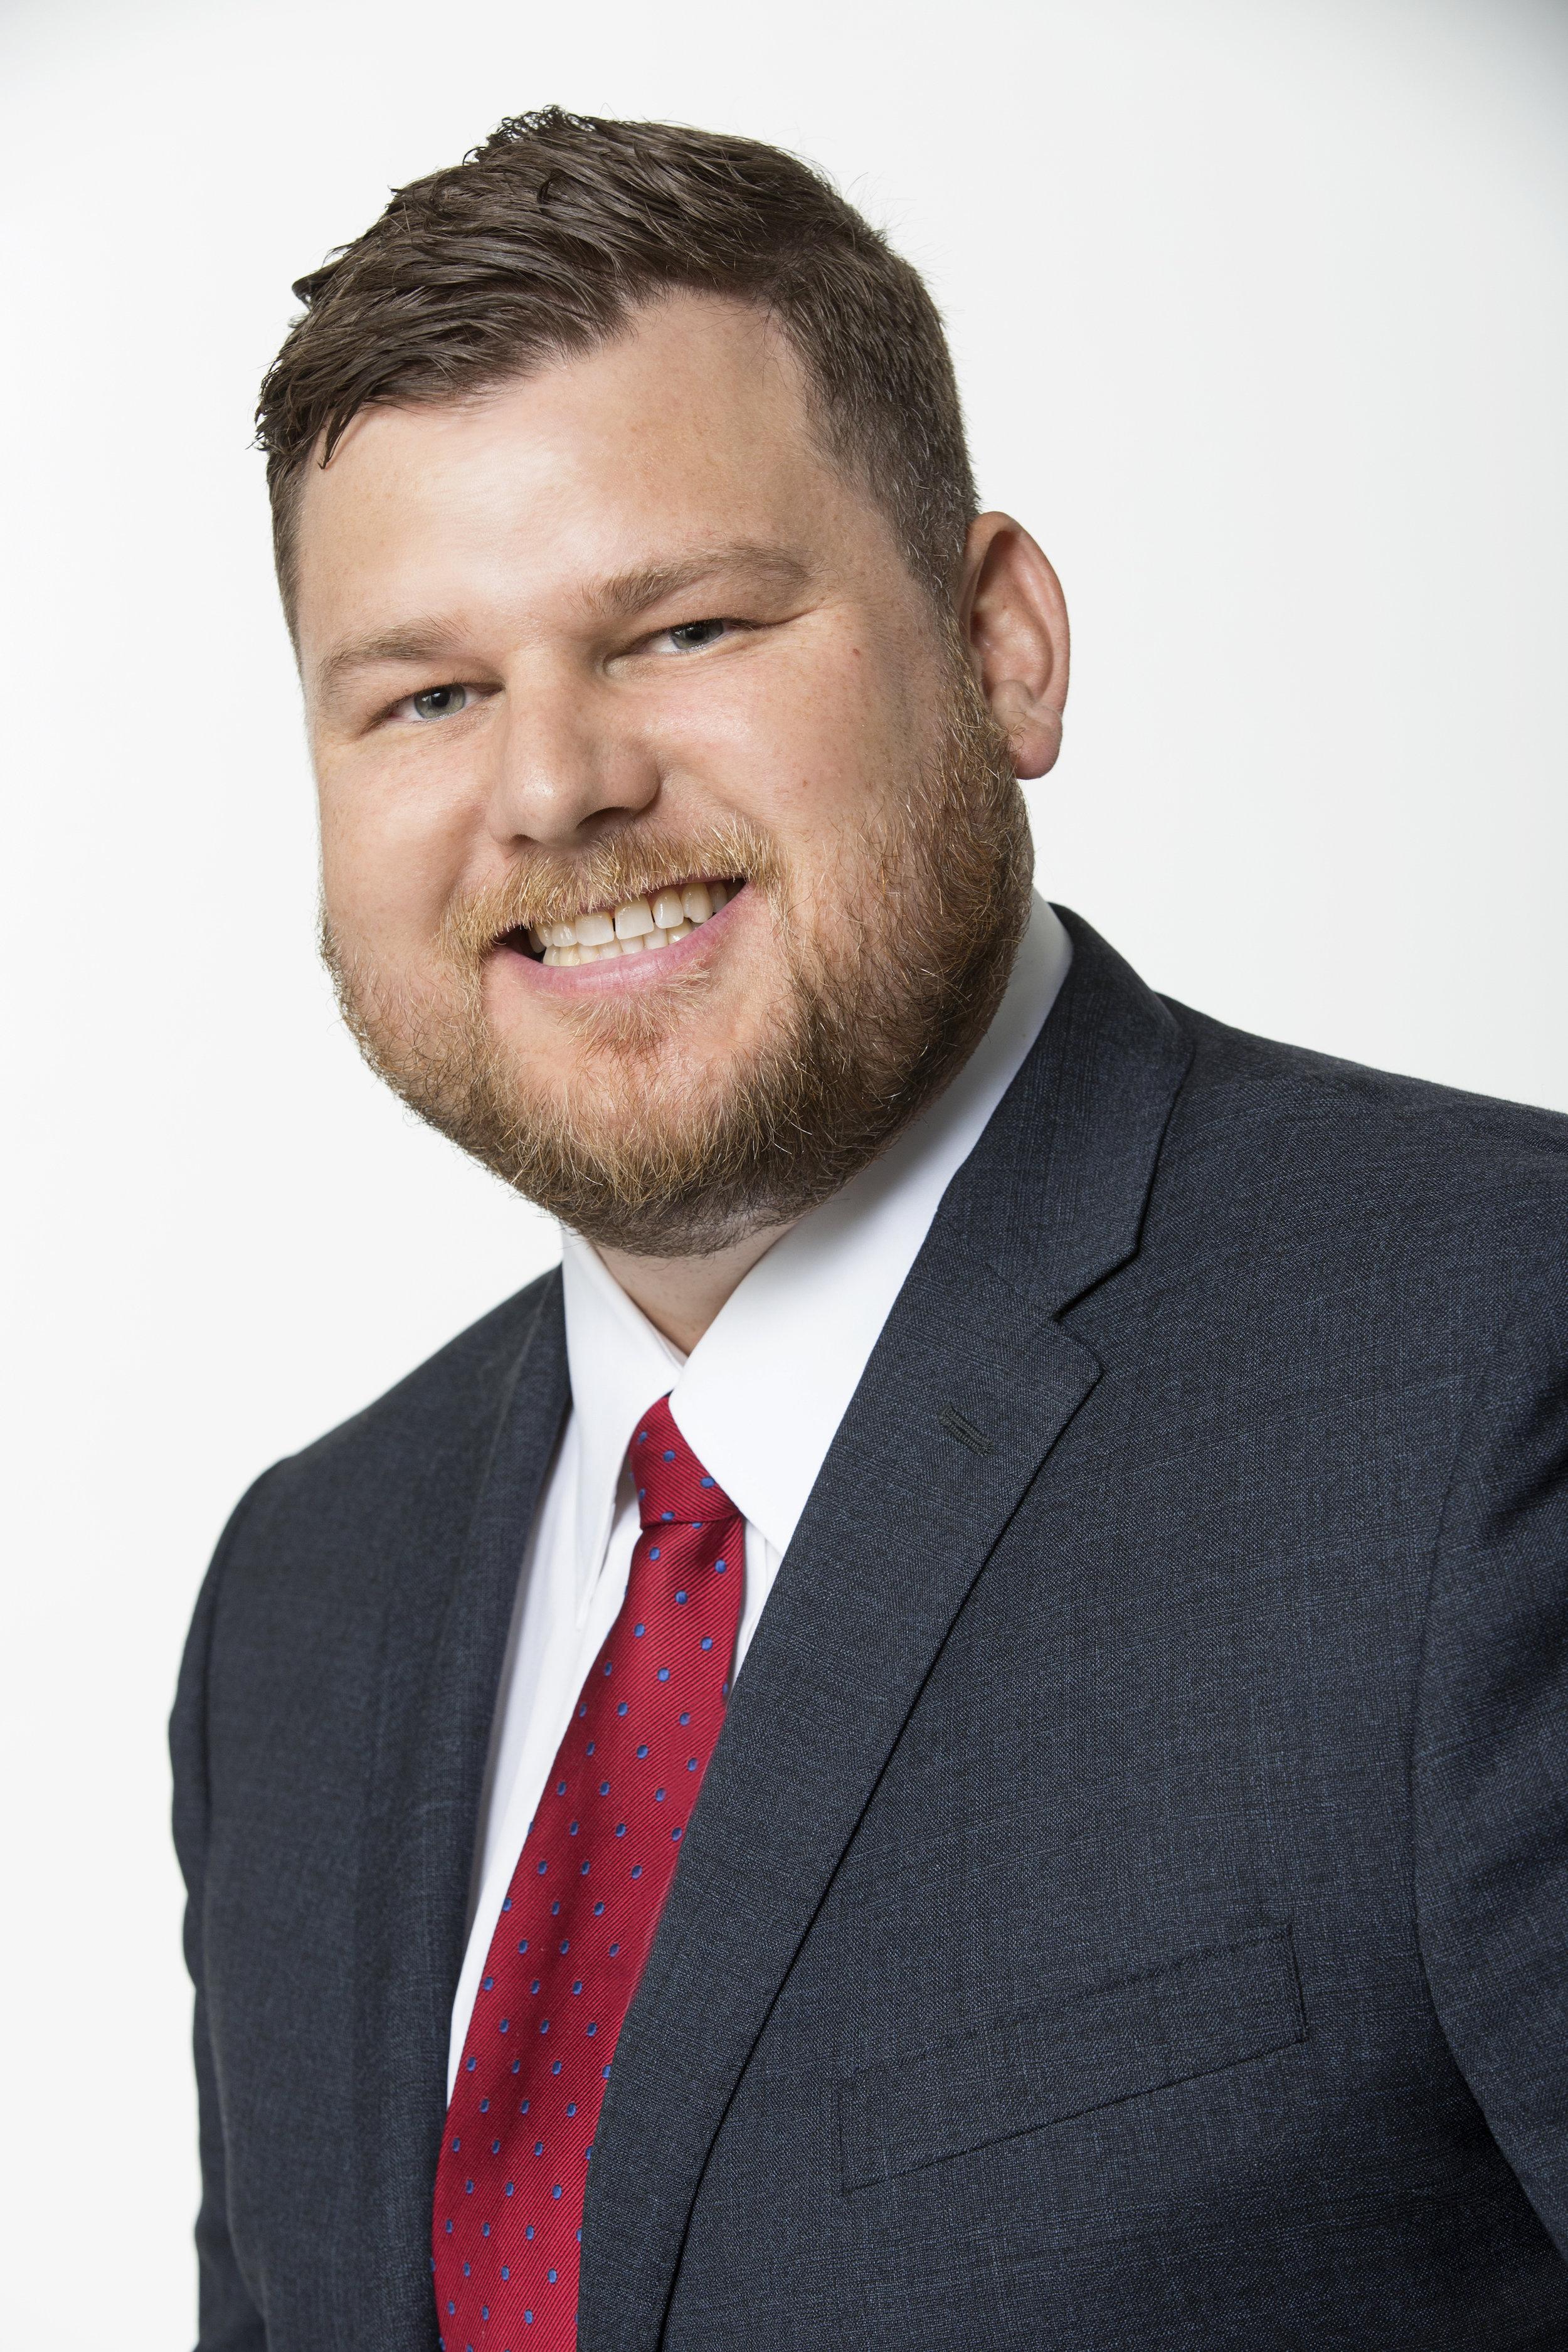 Daniel l. sadler - Attorney at Law